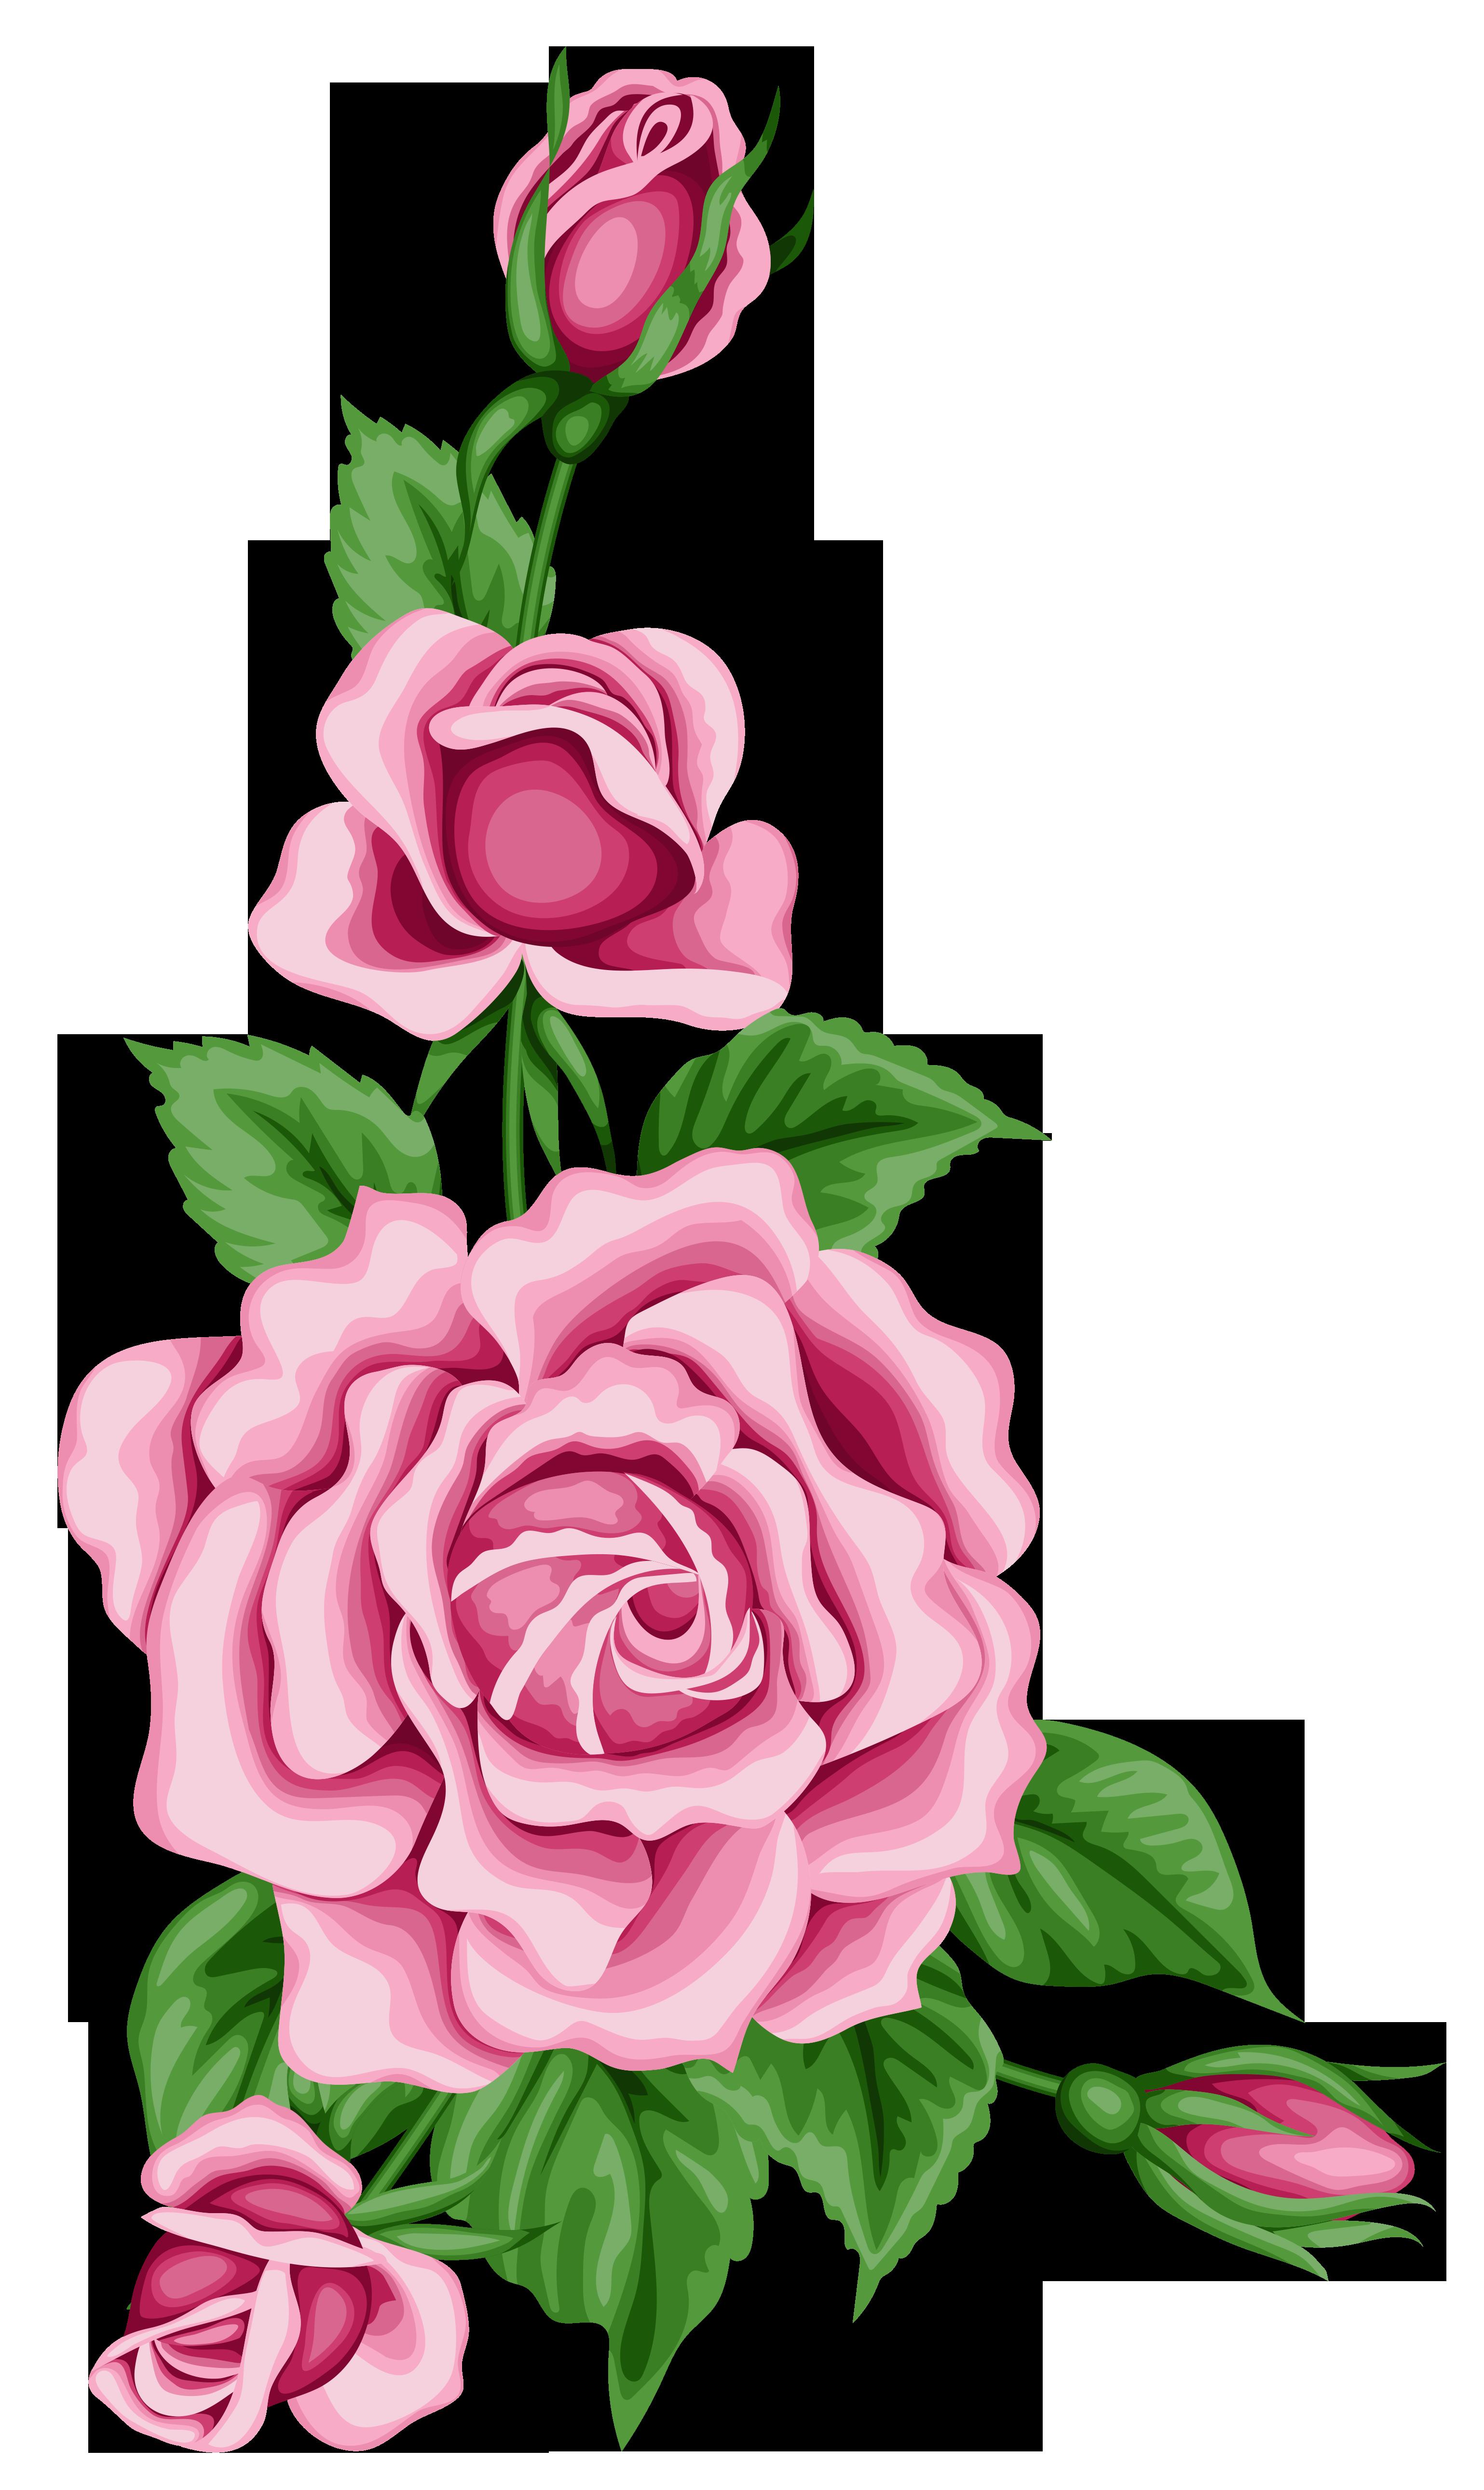 Roses Decoration Png Clipart Image Flower Clipart Flower Painting Flower Art